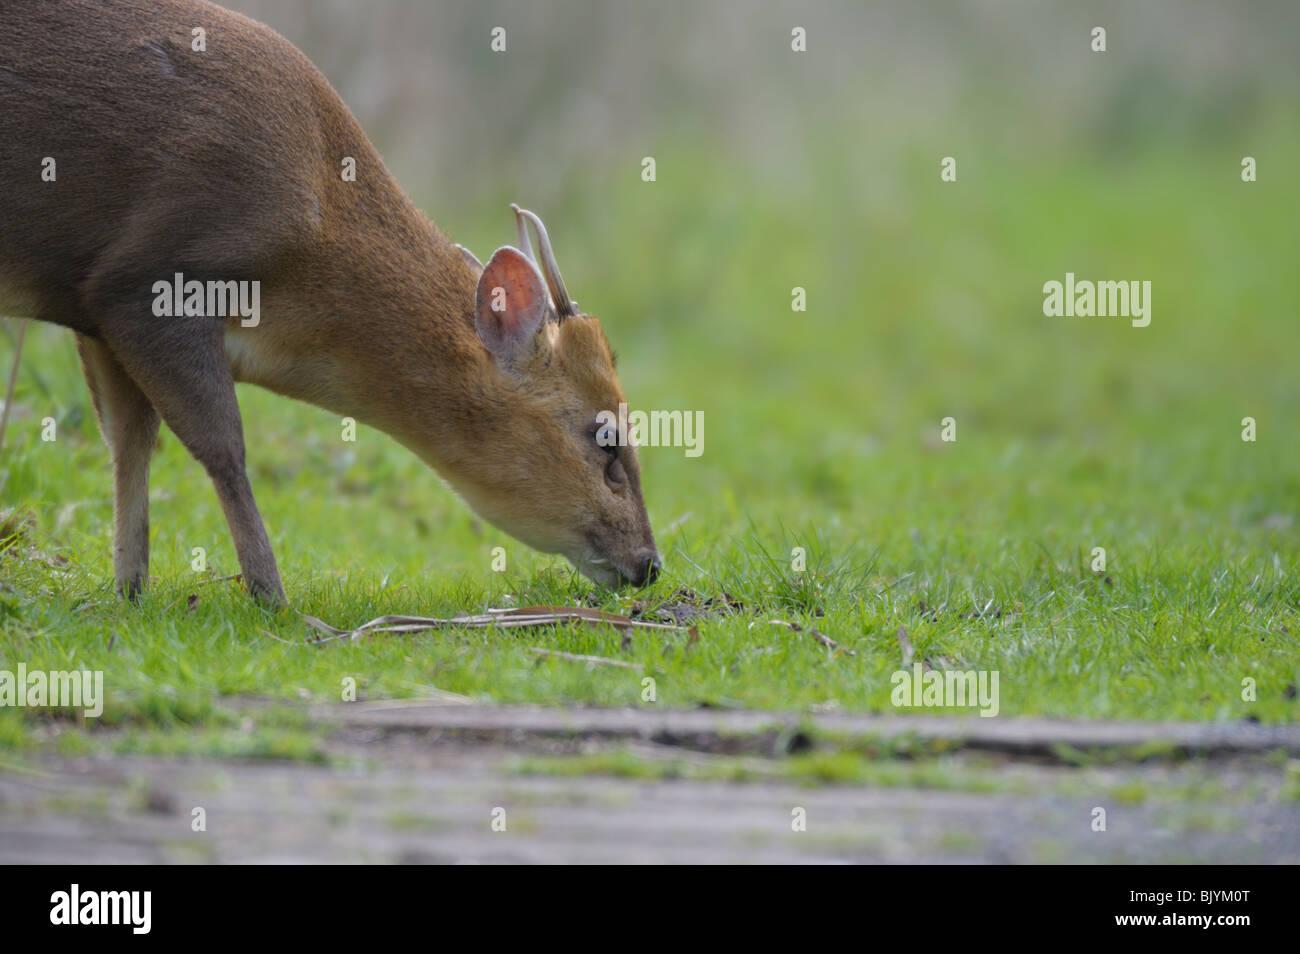 Reeves Muntjac(Muntiacus reevesi) feeding on grasses. - Stock Image